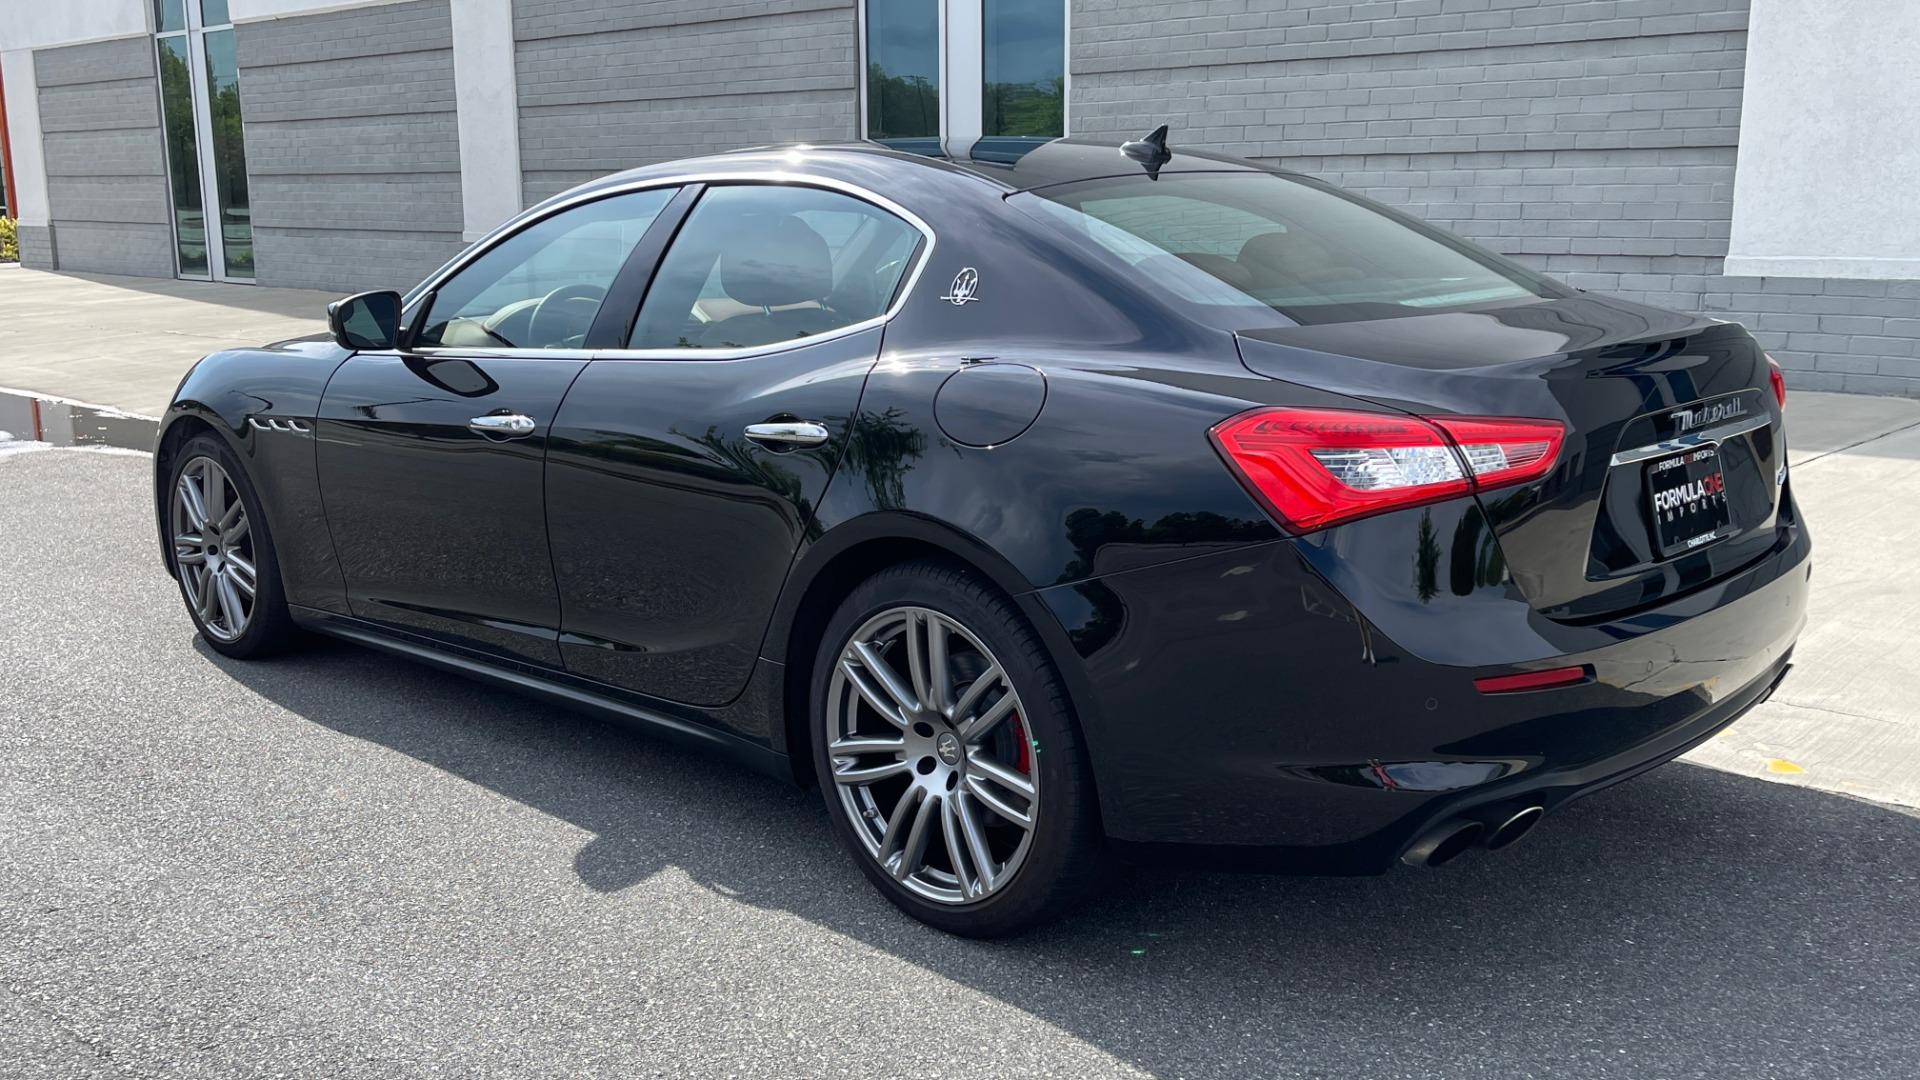 Used 2018 Maserati GHIBLI 3.0L SEDAN / 8-SPD AUTO / NAV / SUNROOF / REARVIEW for sale $42,995 at Formula Imports in Charlotte NC 28227 6